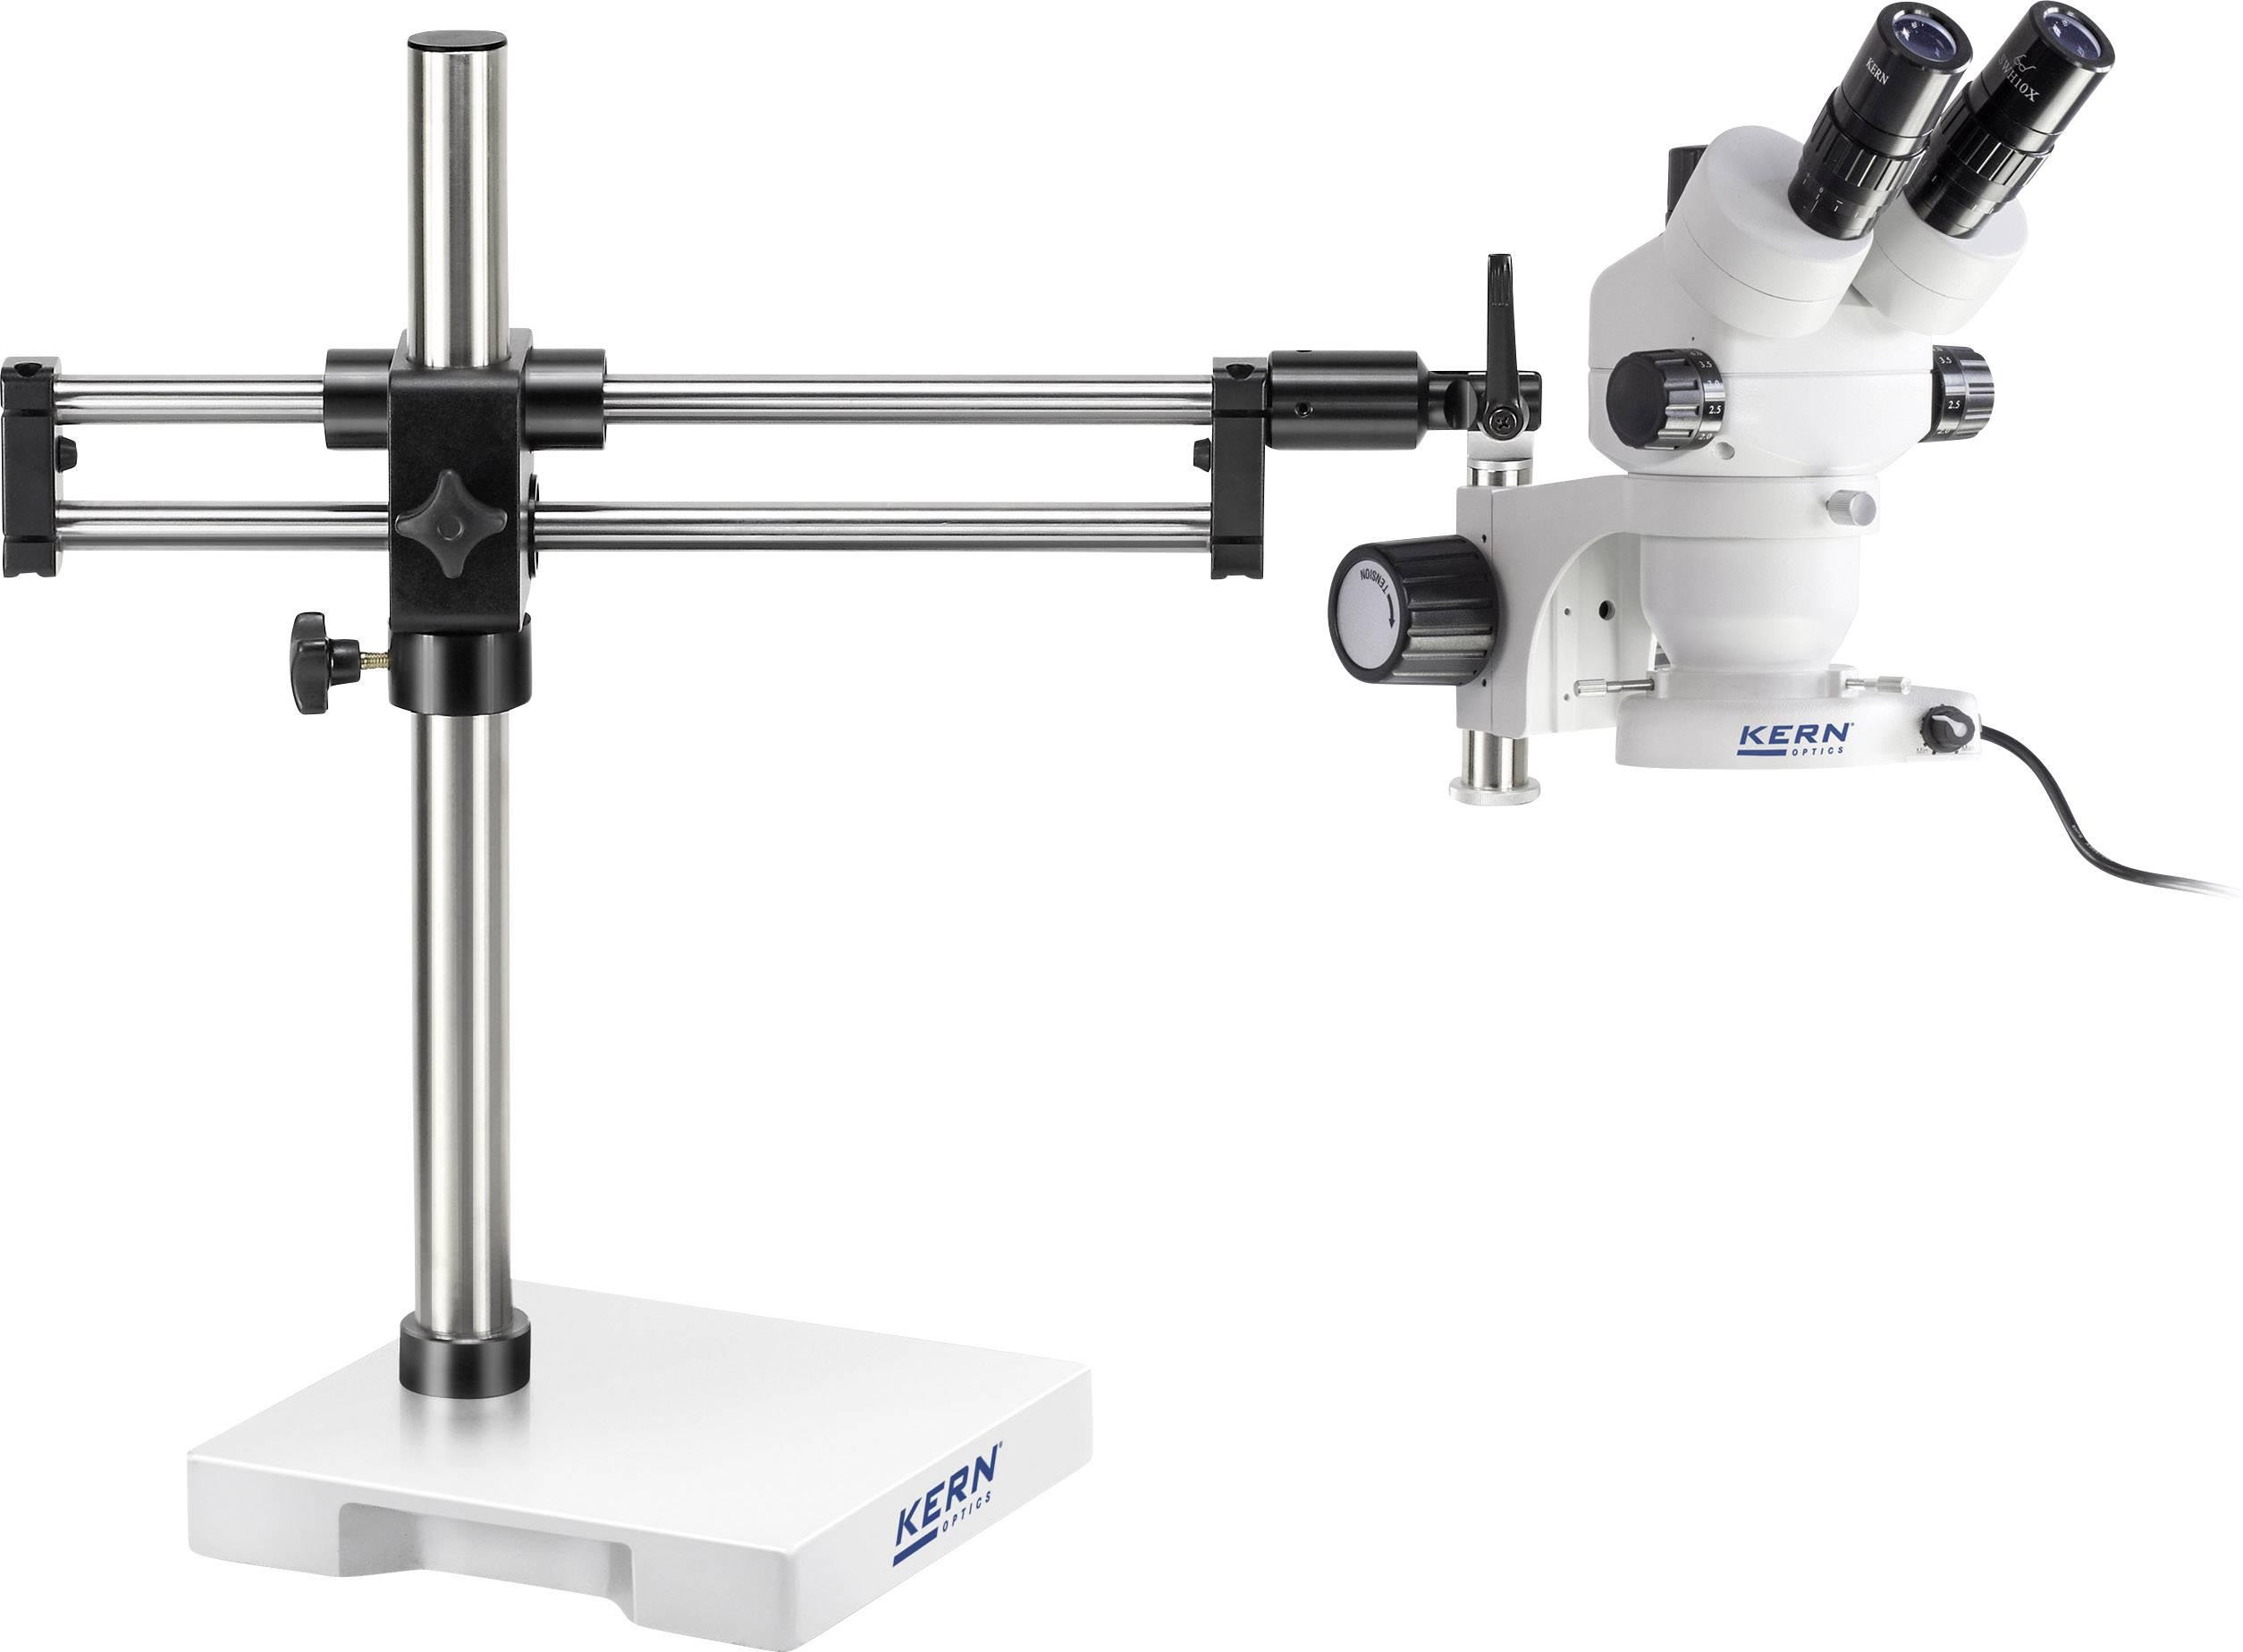 Stereo-Zoom Mikroskop  Kern Optics OZM 932